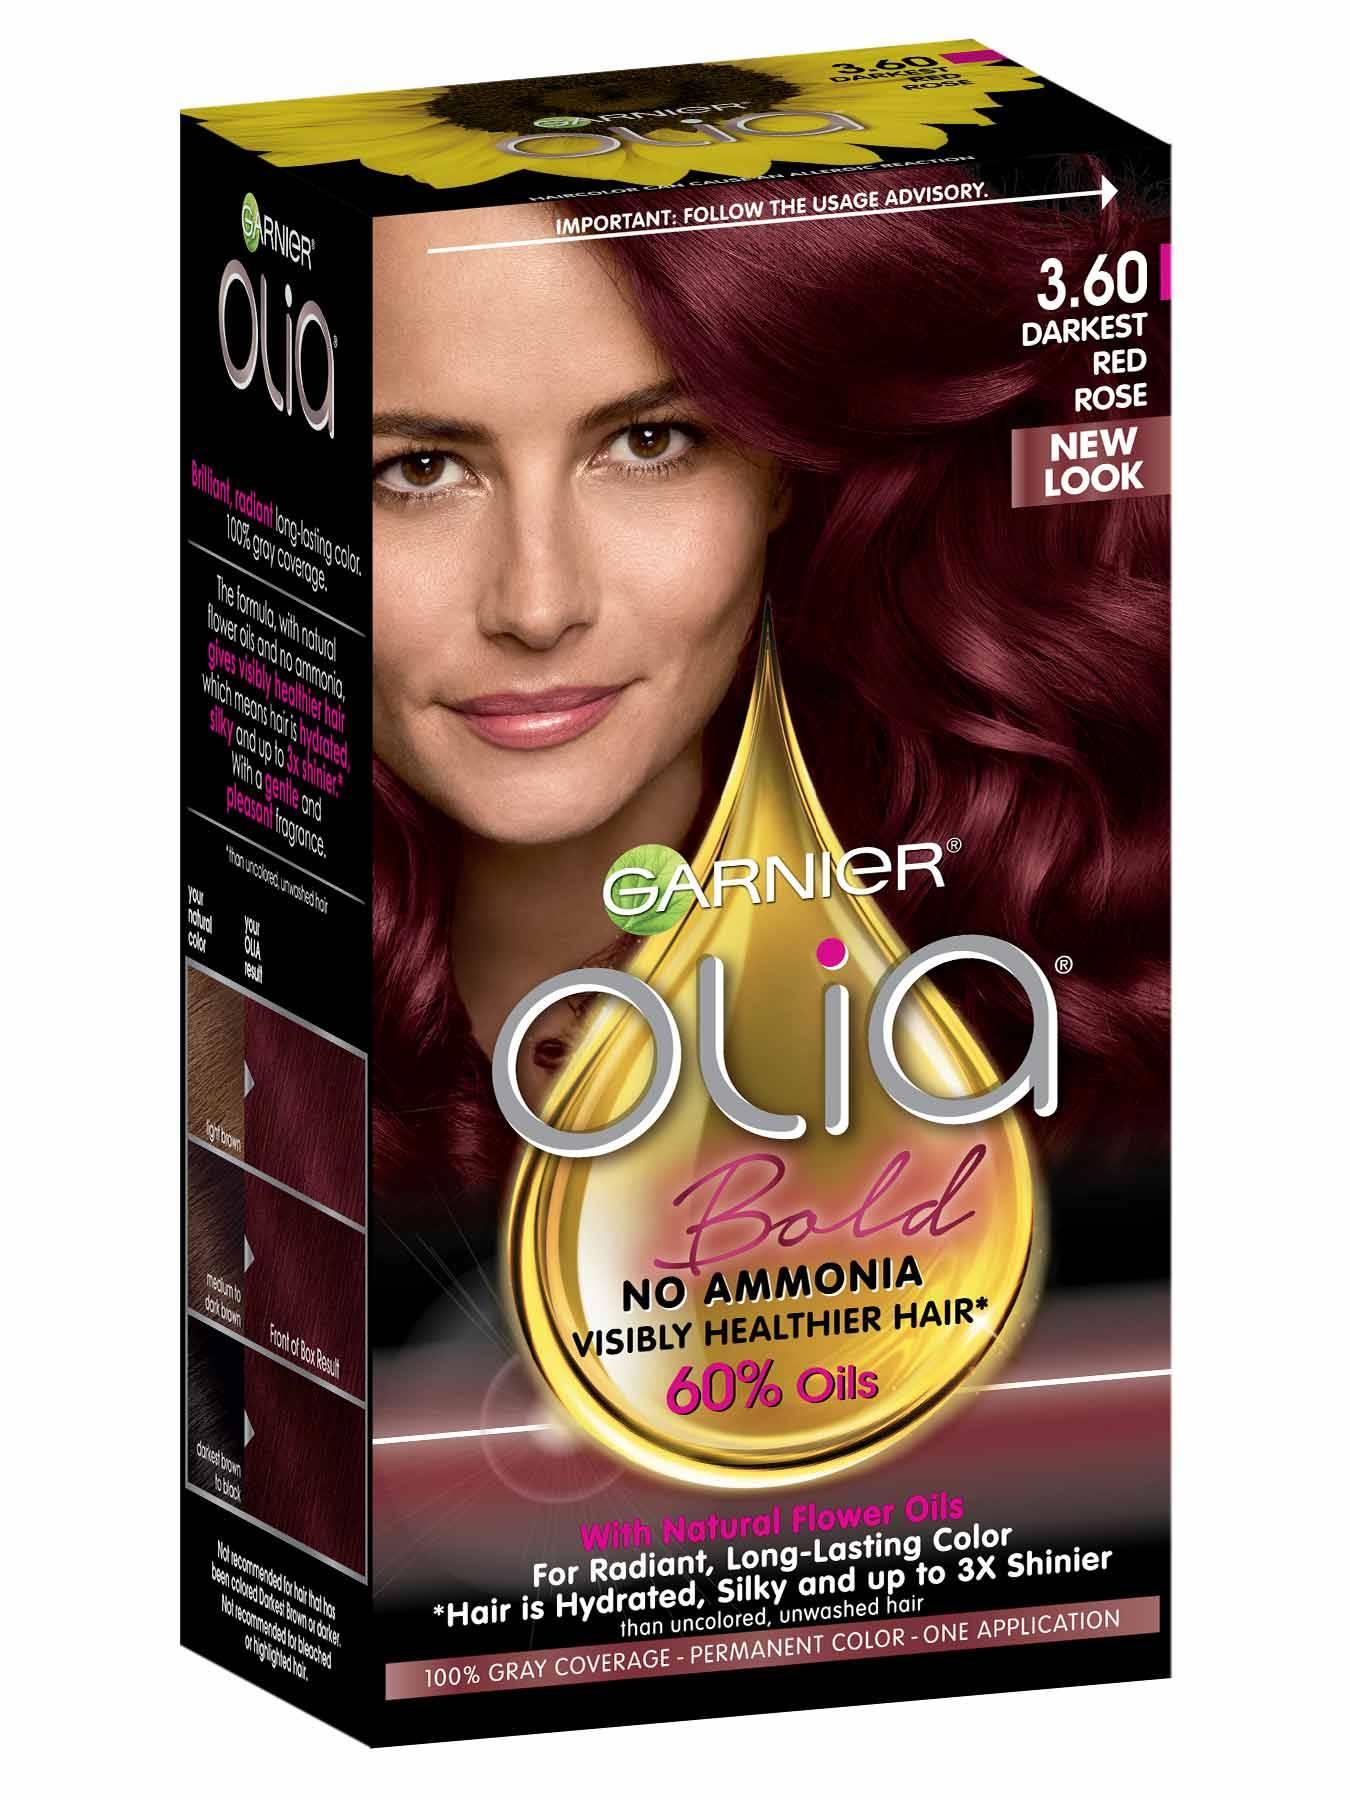 Olia Darkest Red Rose Hair Color Ammonia Free Hair Dye